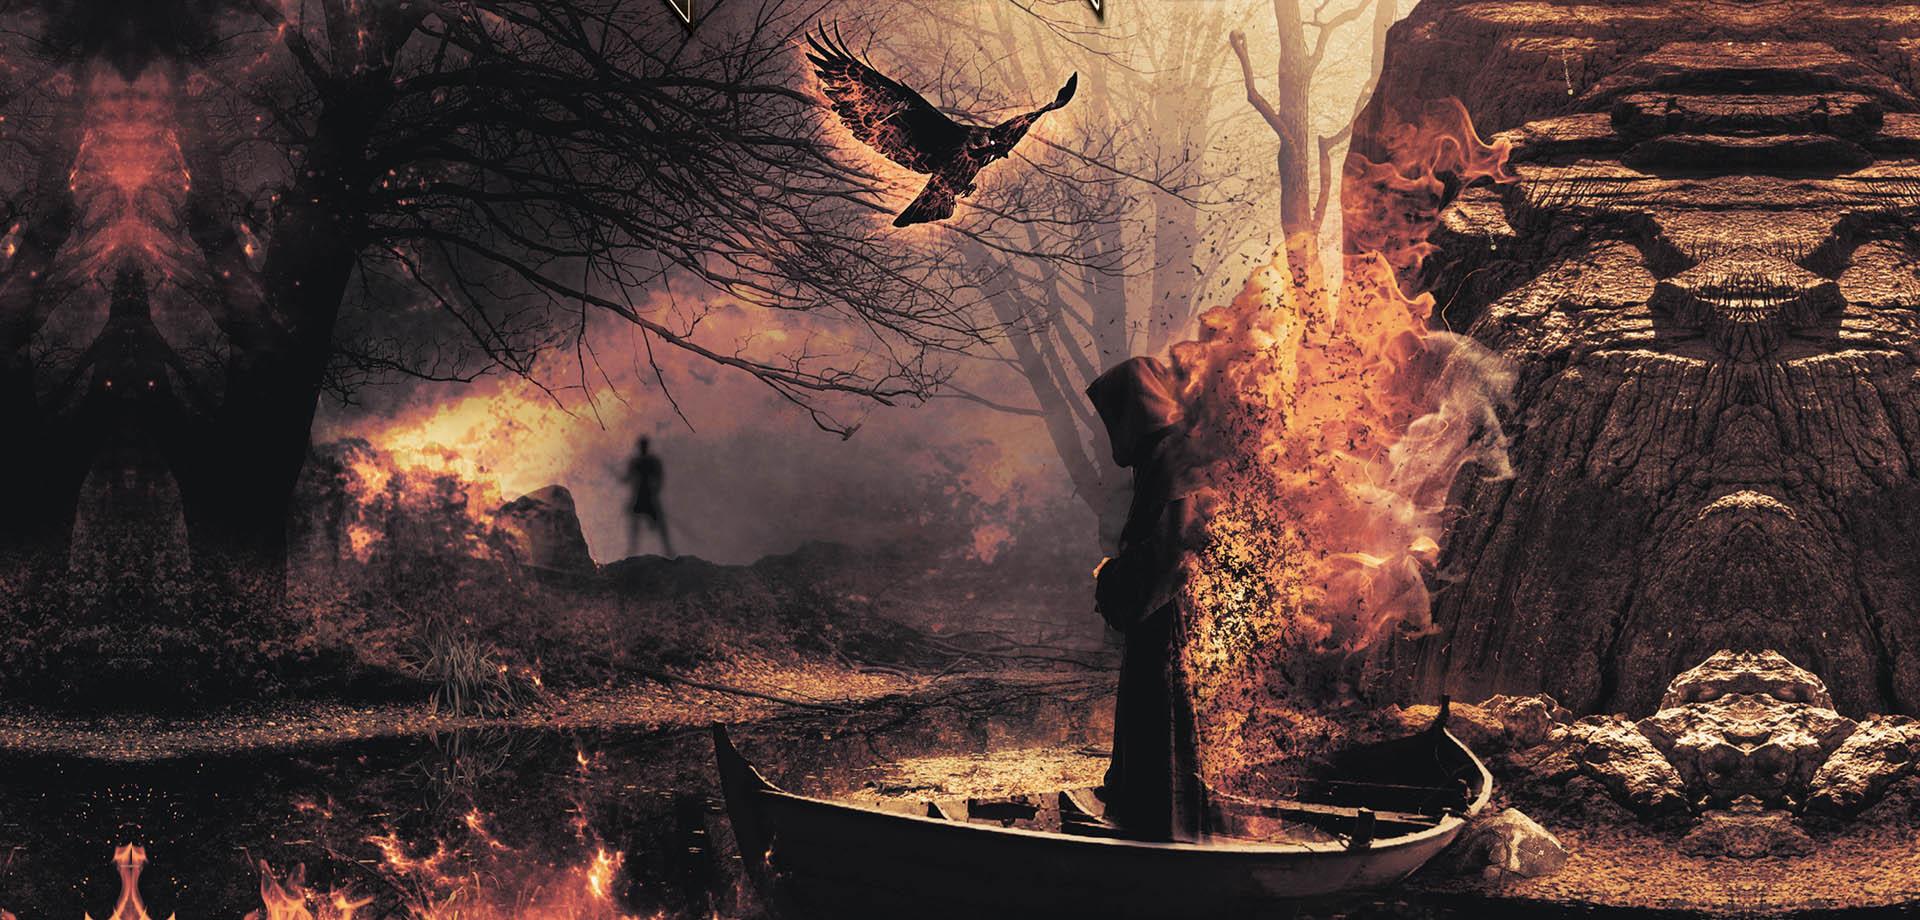 BURNING POINT - The Blaze